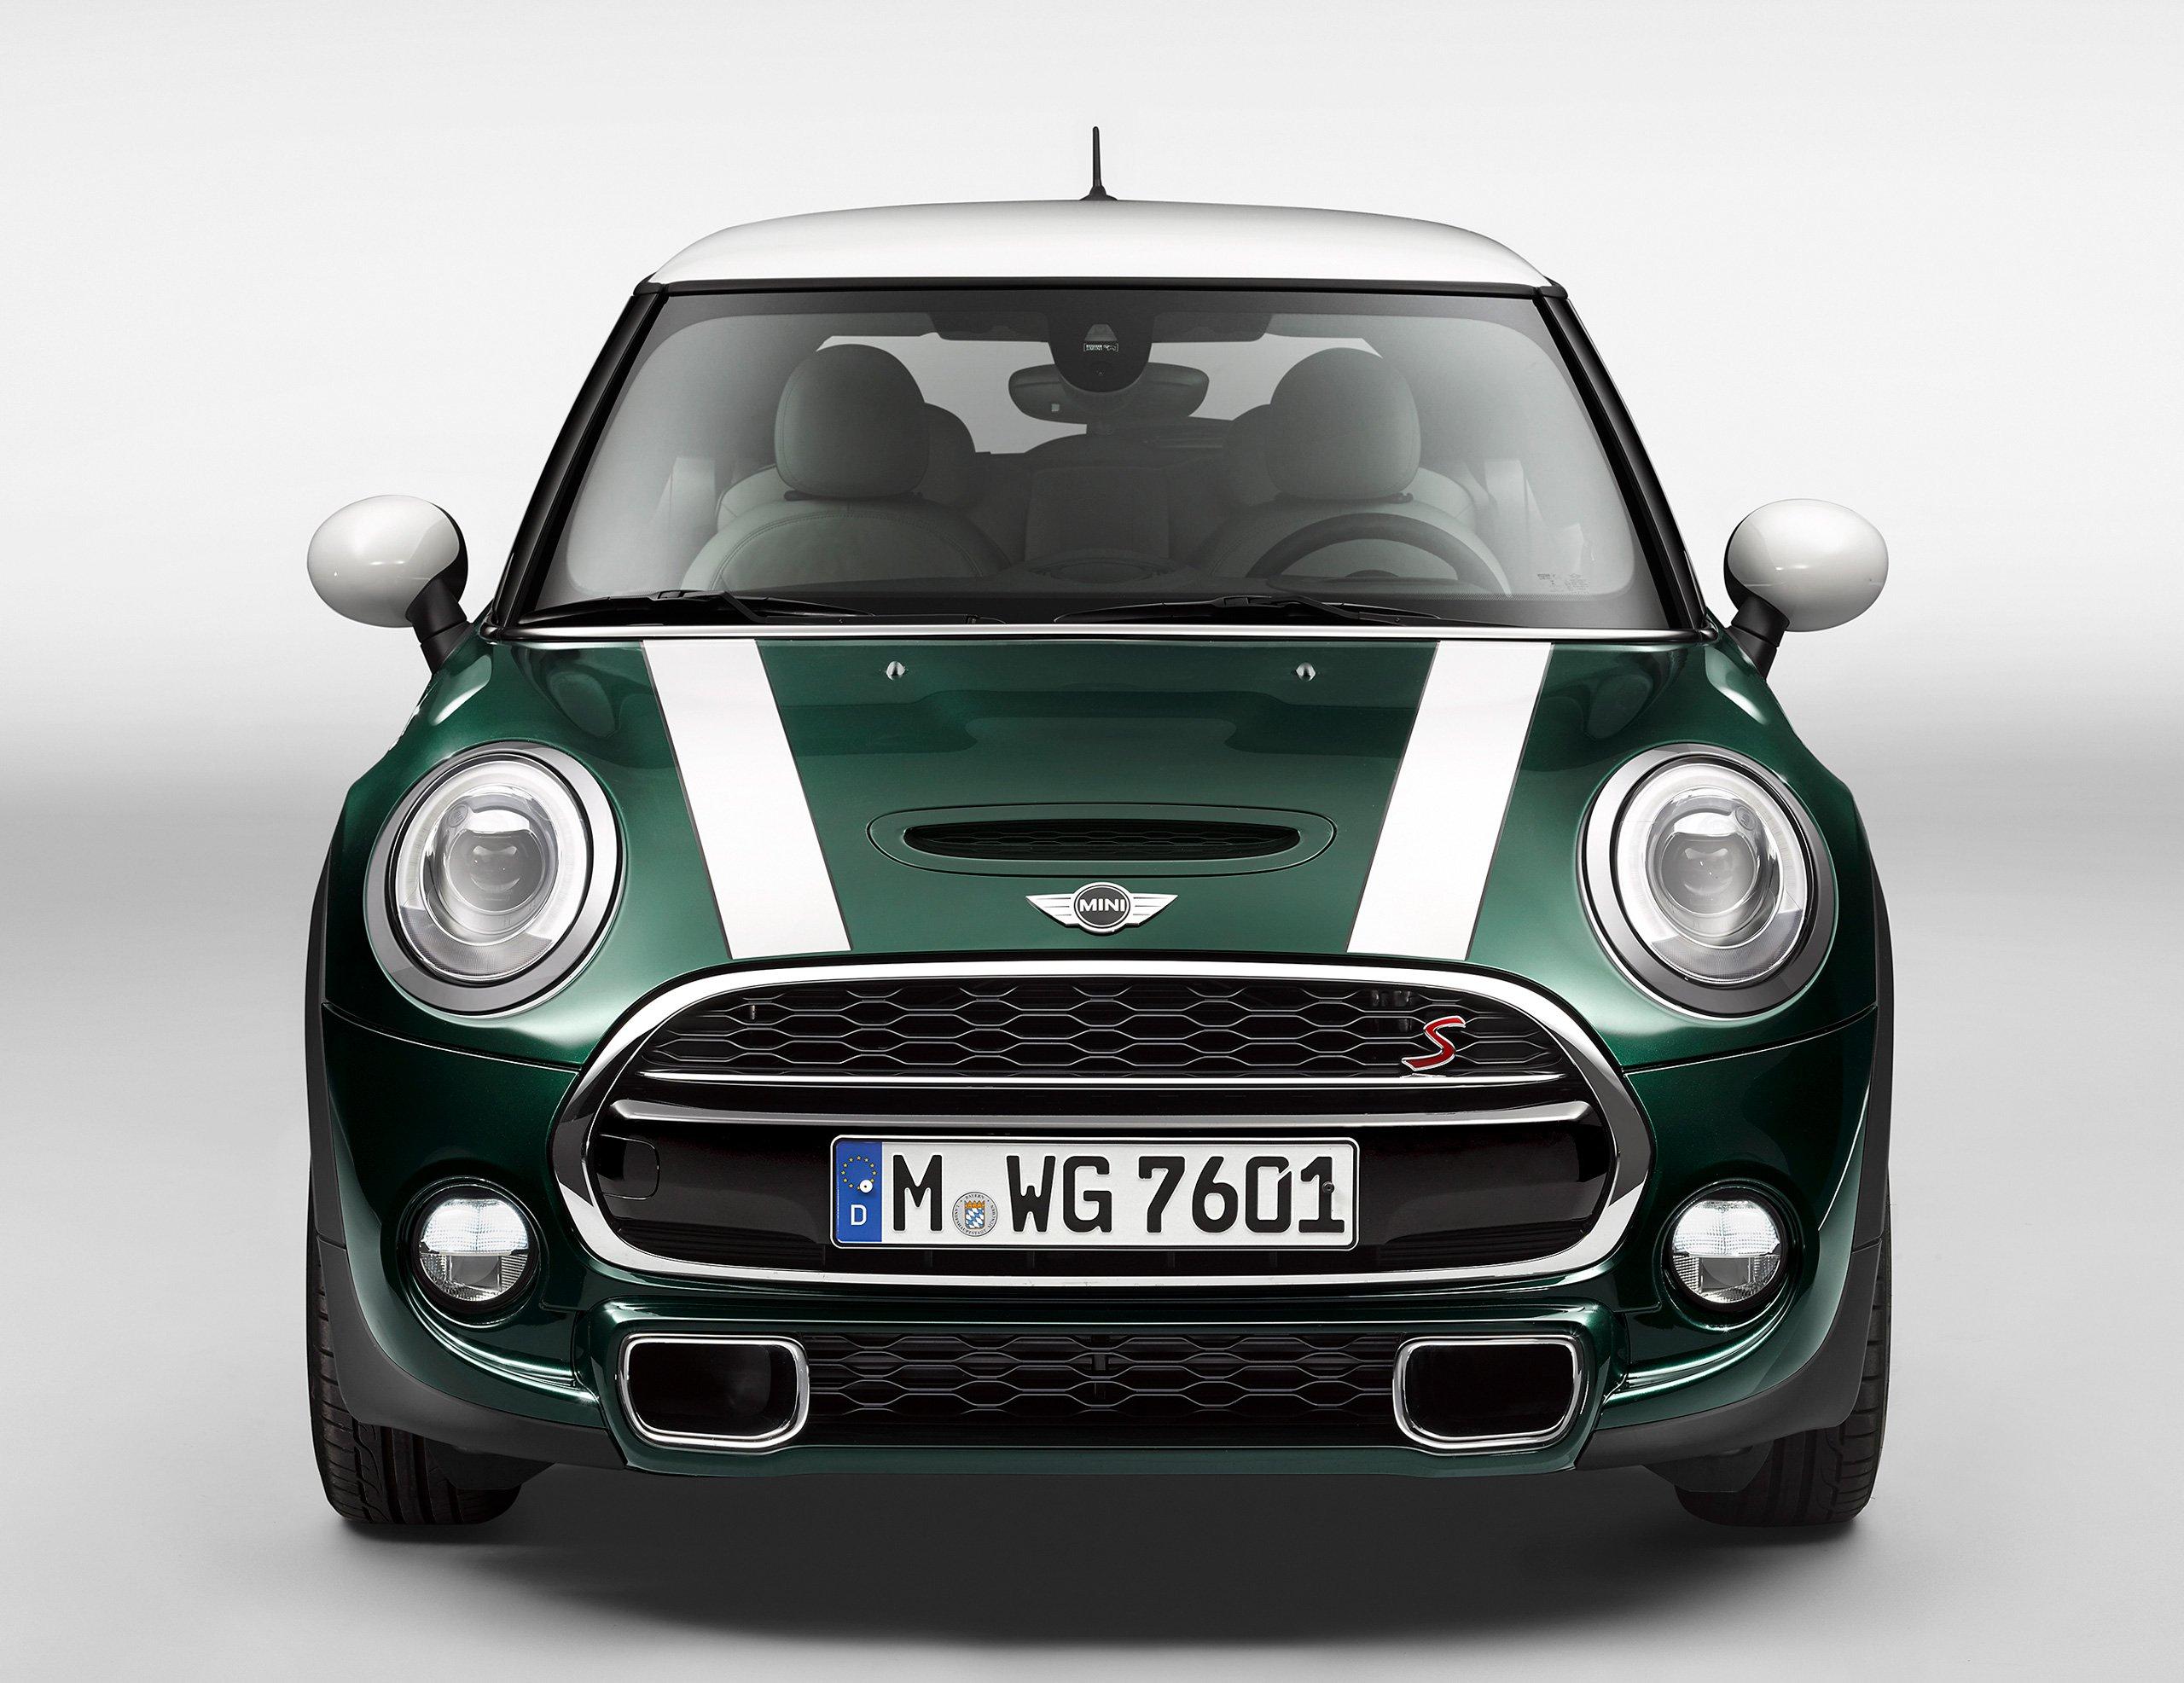 Mini Cooper Sd F56 >> F56 MINI One First and Cooper SD – new base petrol (75 hp/150 Nm) and top diesel (170 hp/360 Nm ...